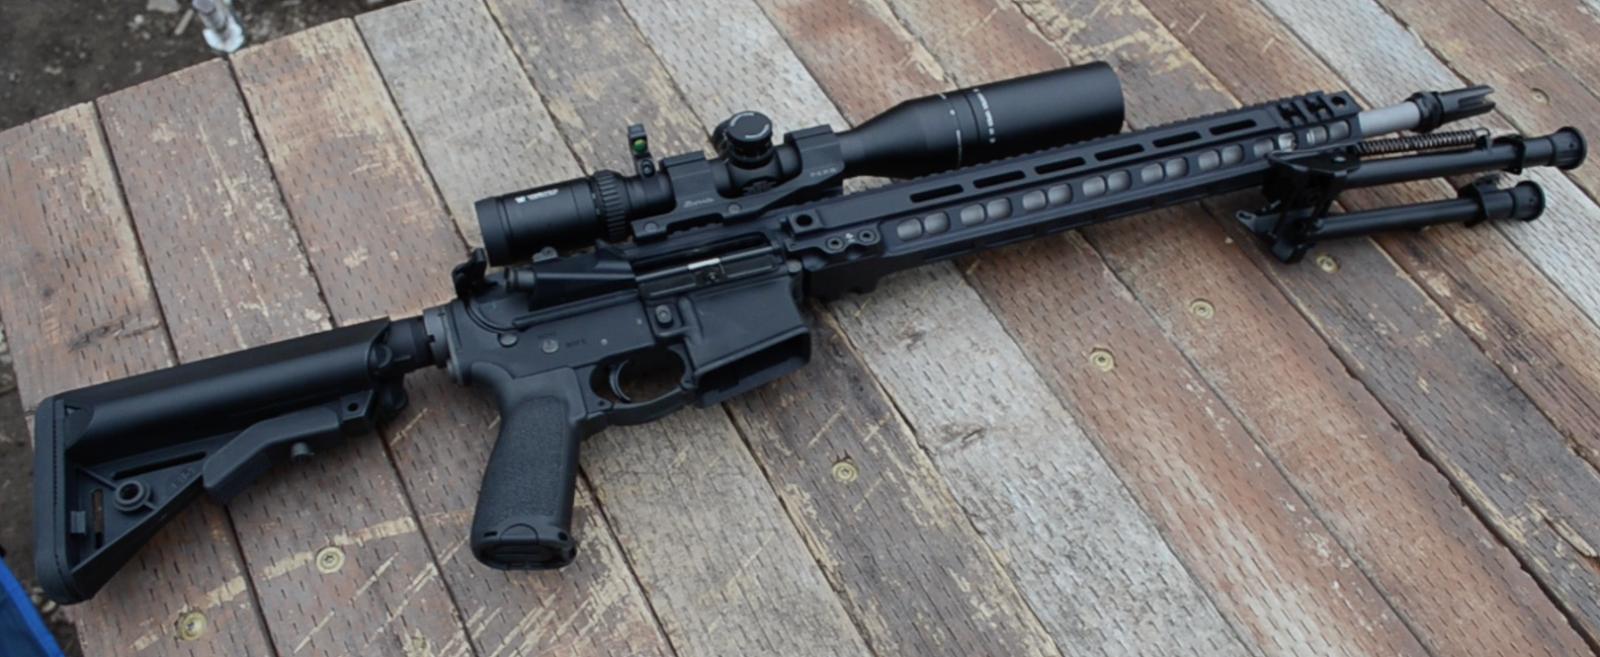 MK12 MOD Awesome SPR Rifle